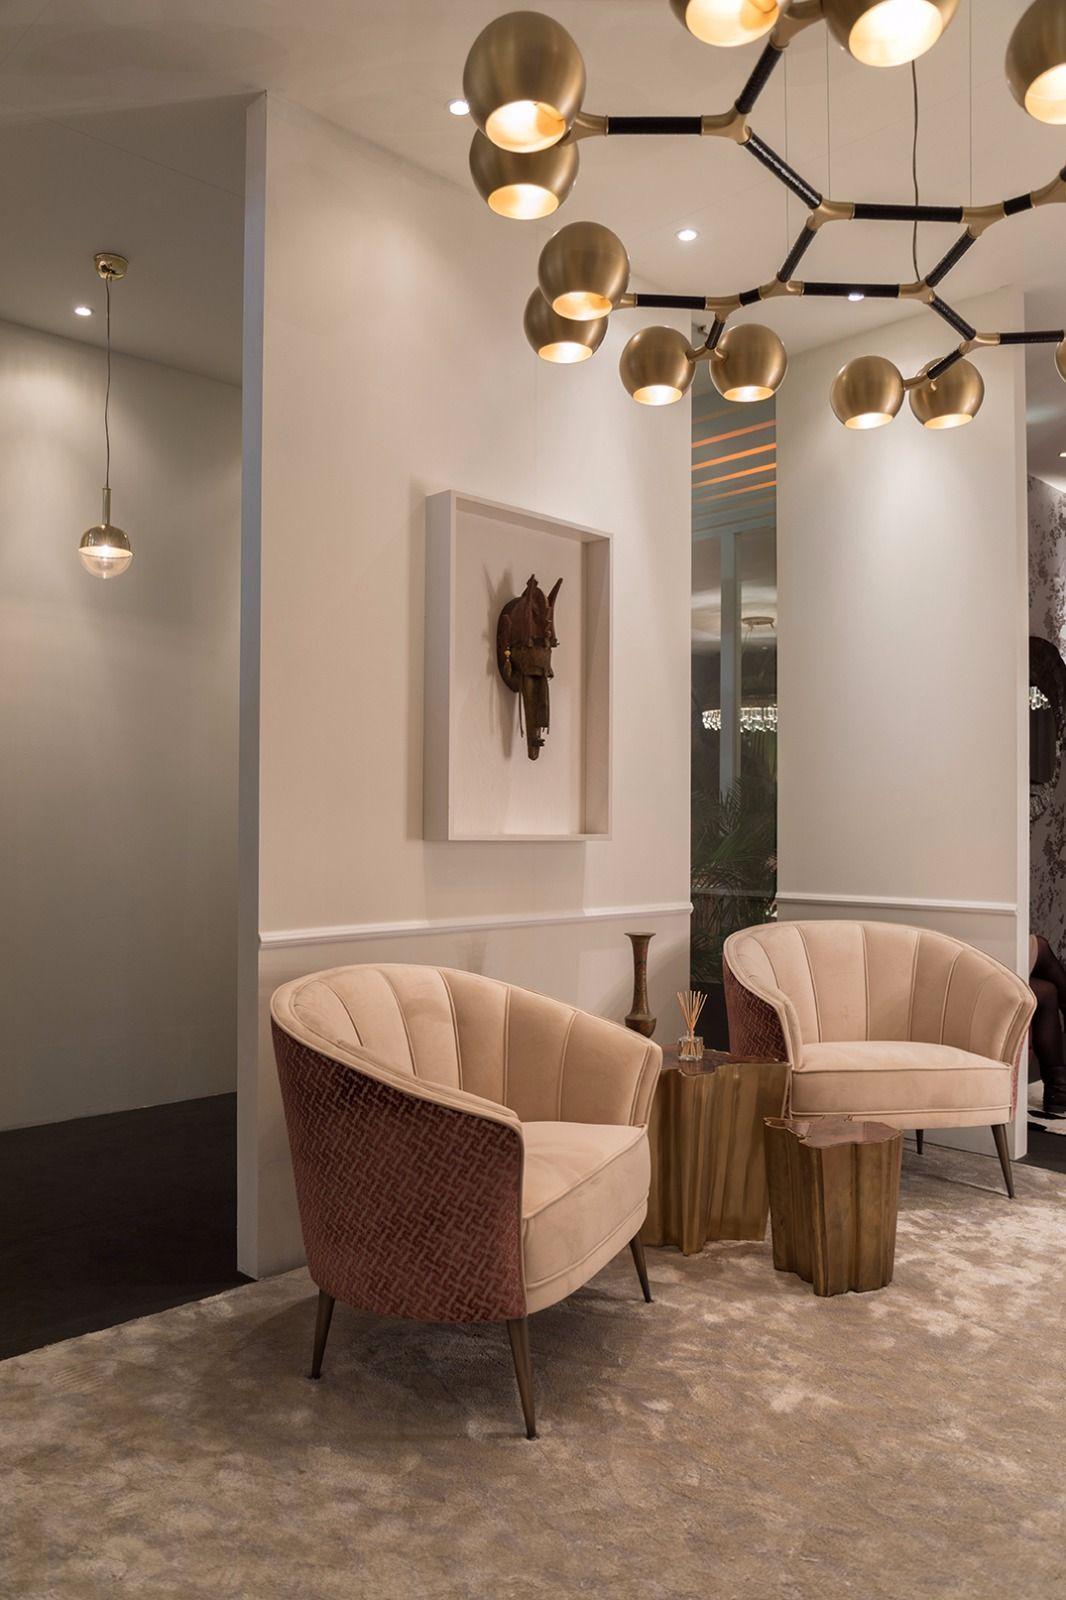 Maison Et Objet 2019 The Best Of Interior Dining Room Design Interior Design